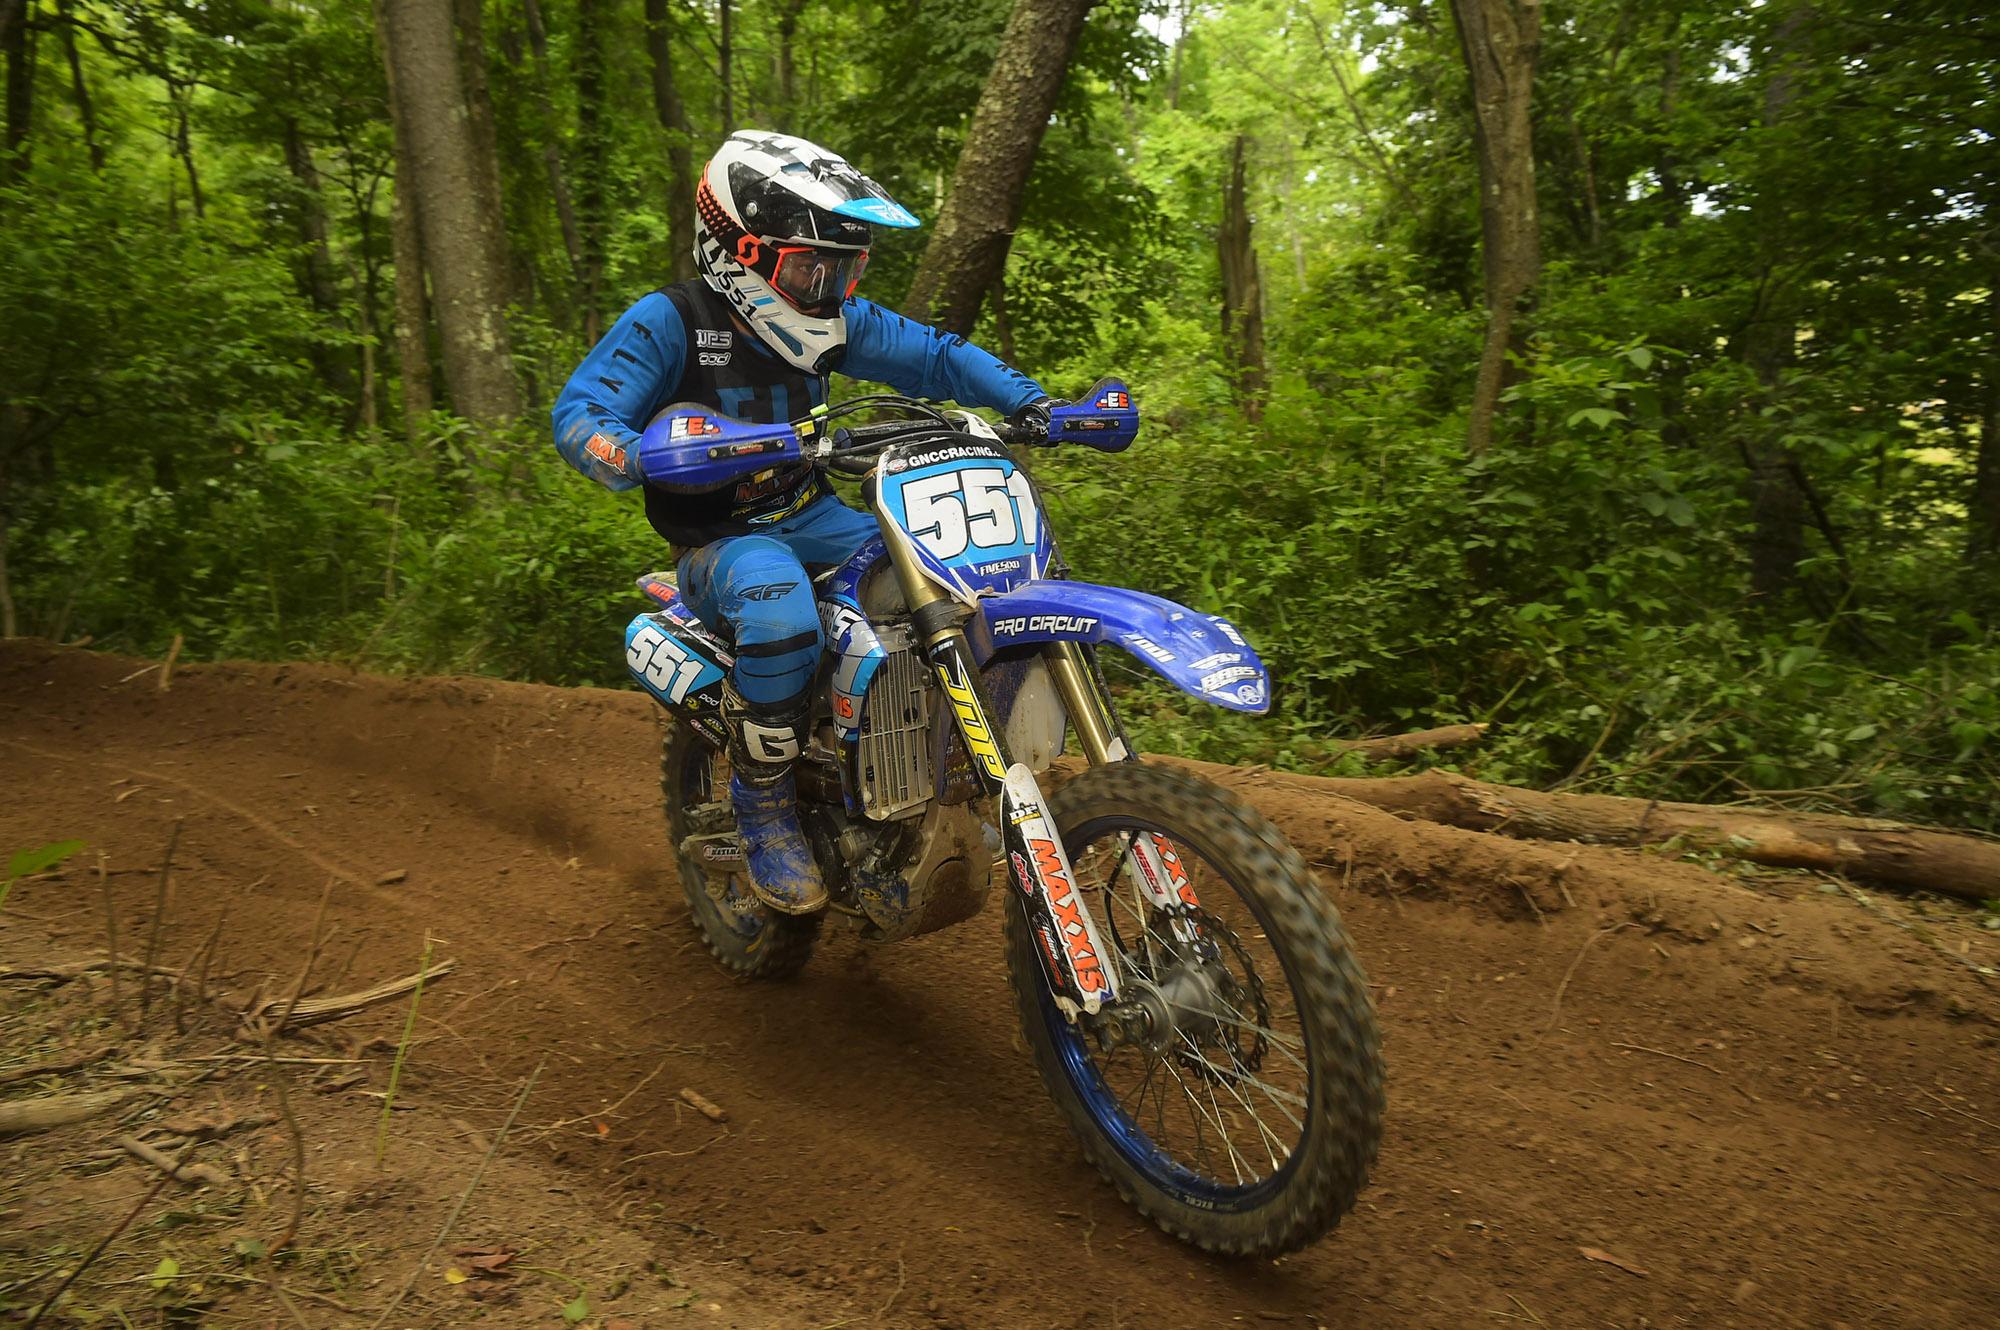 200723 Yamaha bLU cRU and BABS Racing's Becca Sheets